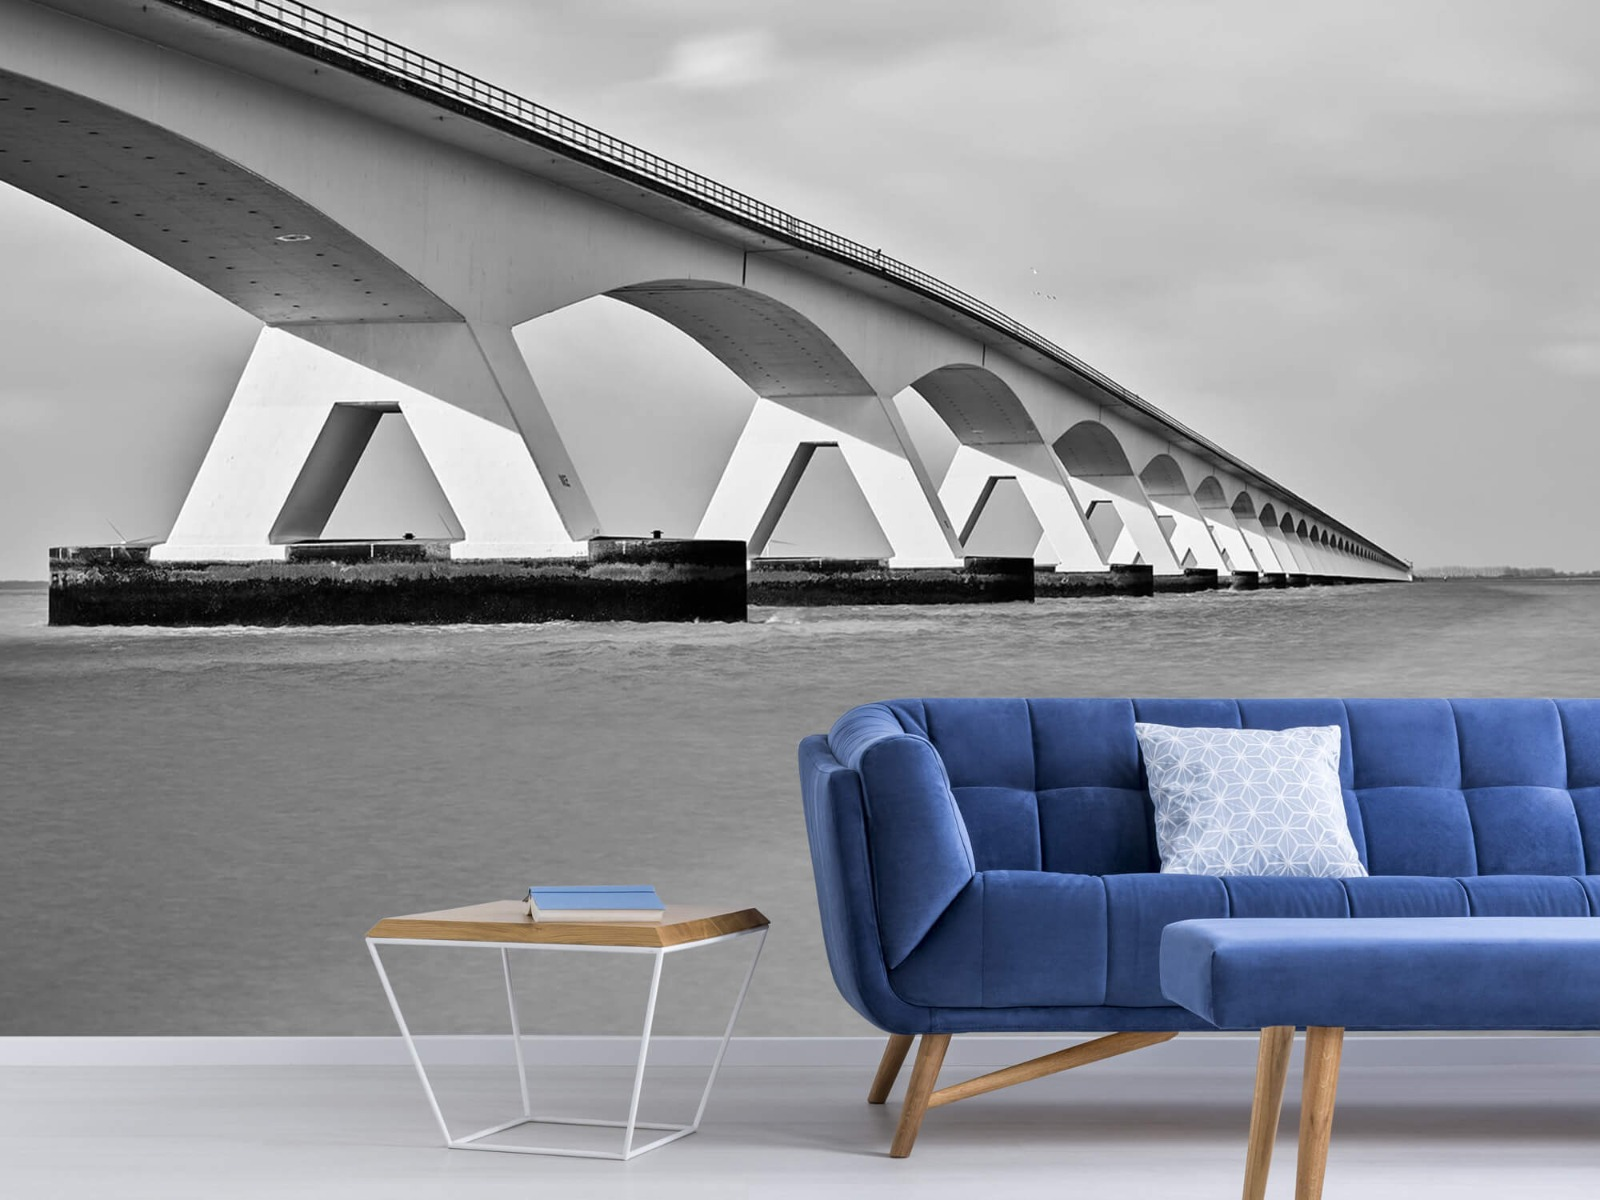 Zwart Wit behang - Lange brug - Kantoor 5